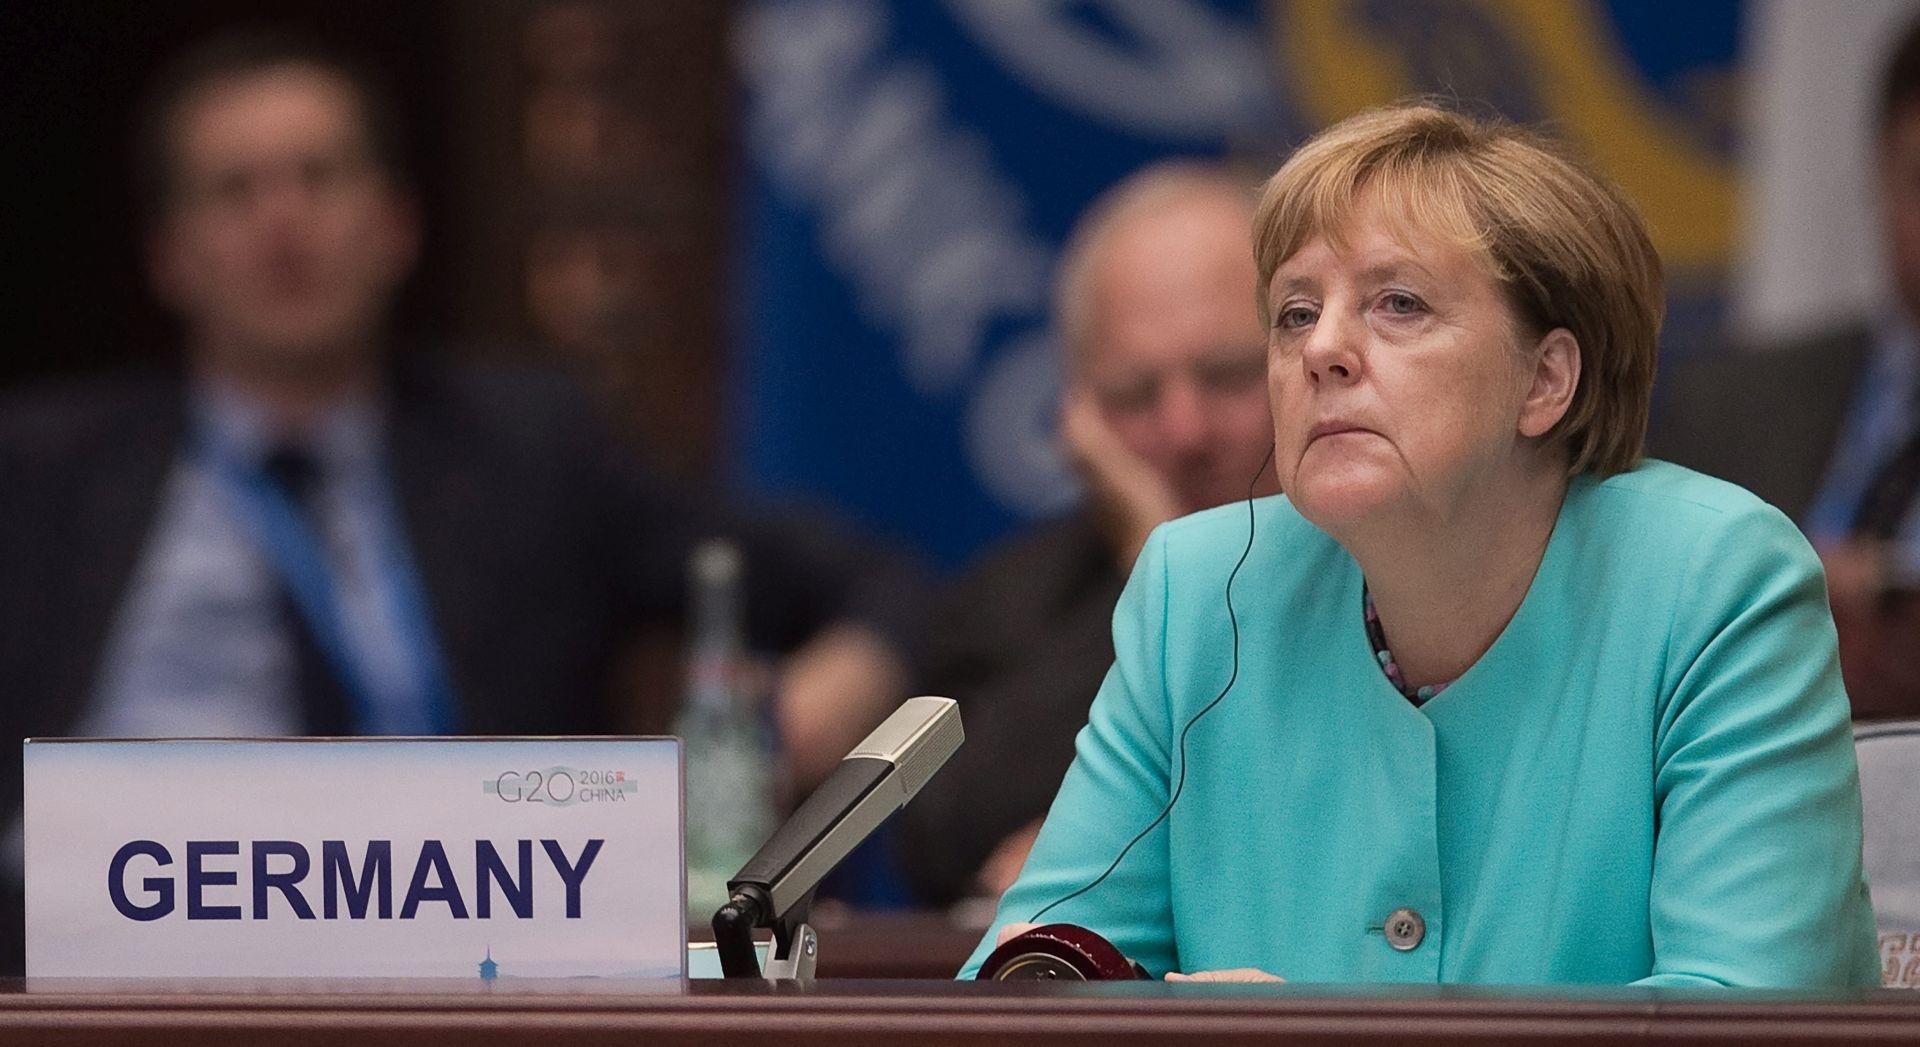 Merkel preuzela odgovornost za poraz, ali ostaje pri svom